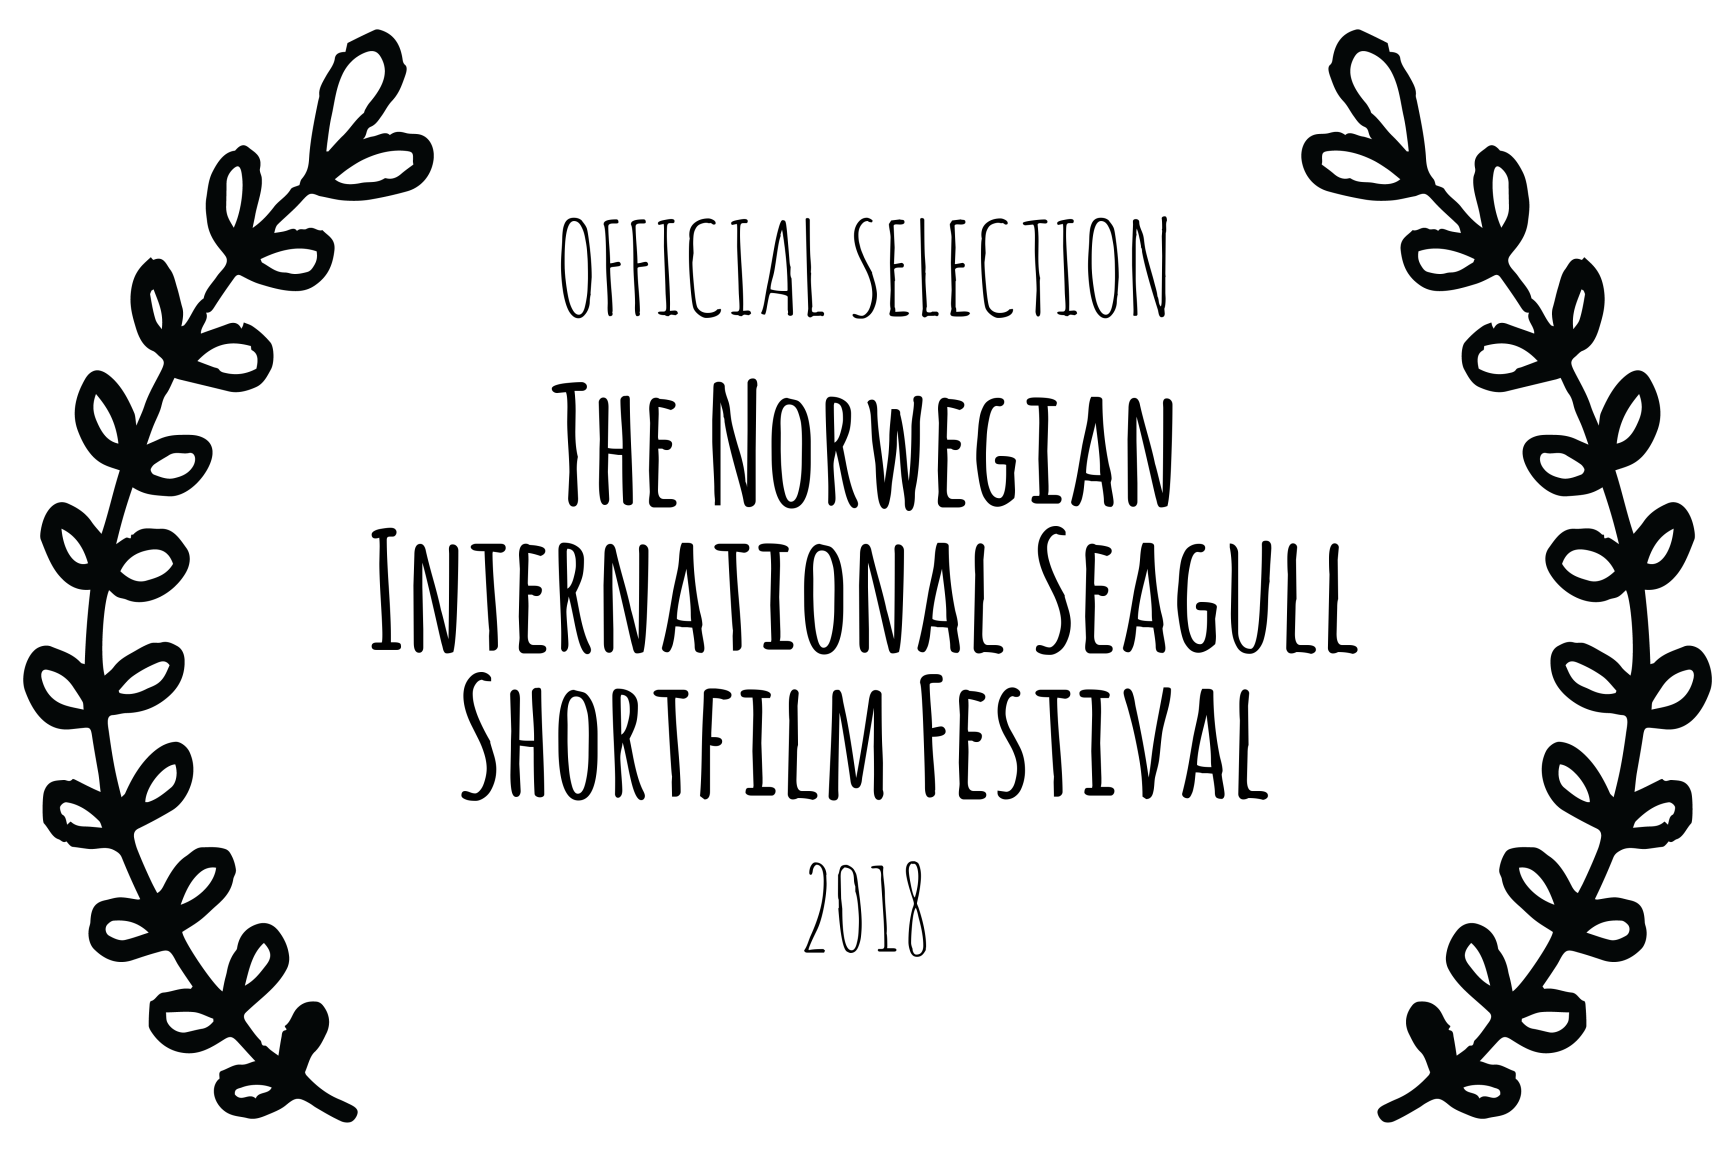 OFFICIAL SELECTION - The Norwegian International Seagull Shortfilm Festival - 2018 (3).png